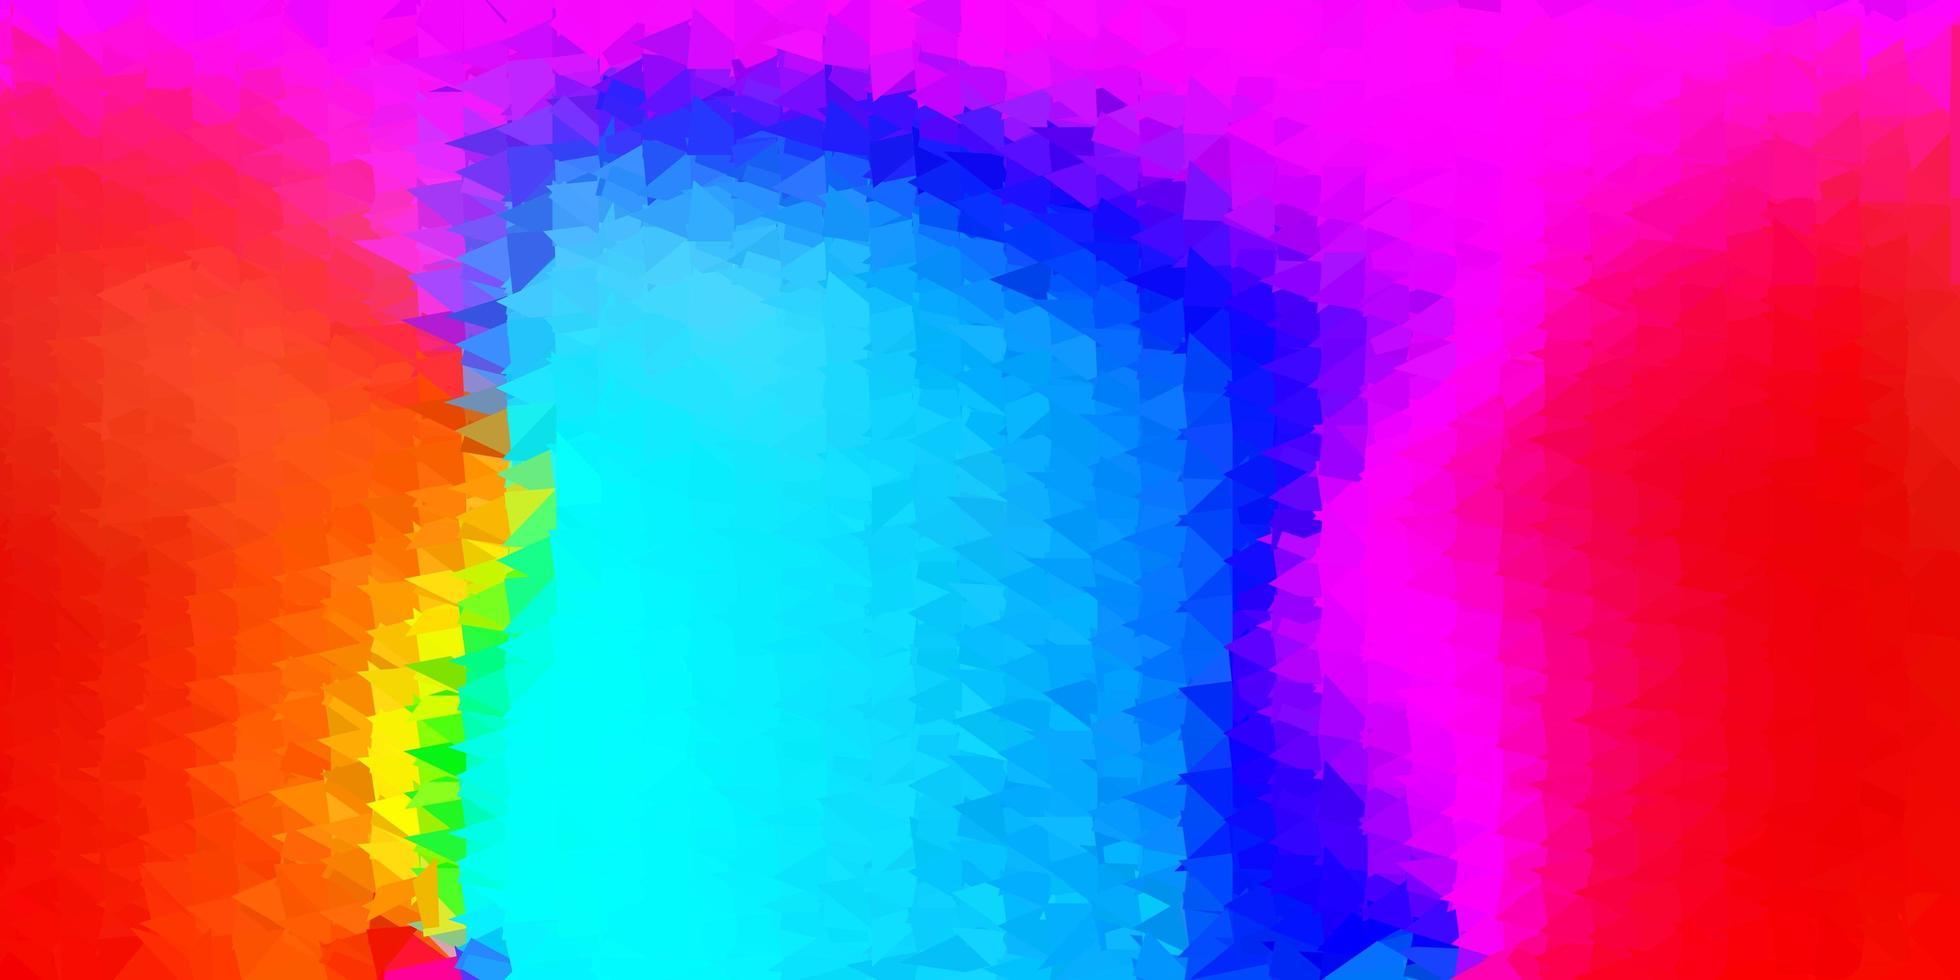 dunkelblaues, rotes Vektordreieck-Mosaikmuster. vektor